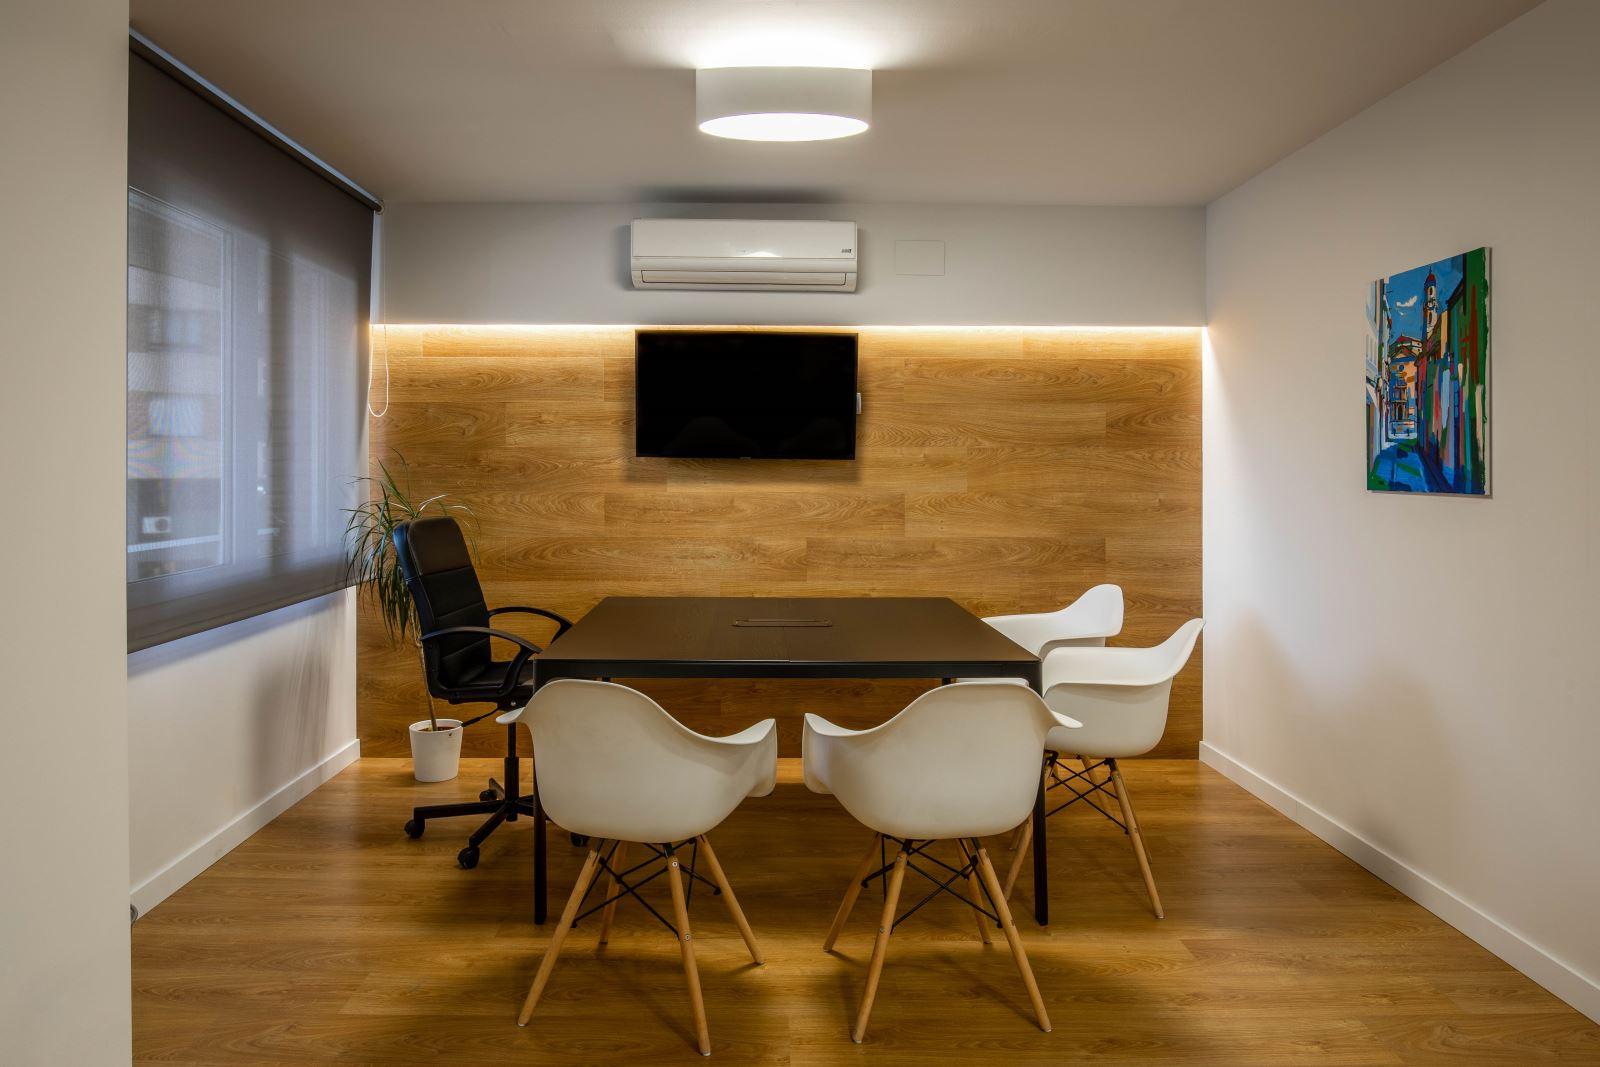 Kontor enginyeria i arquitectura